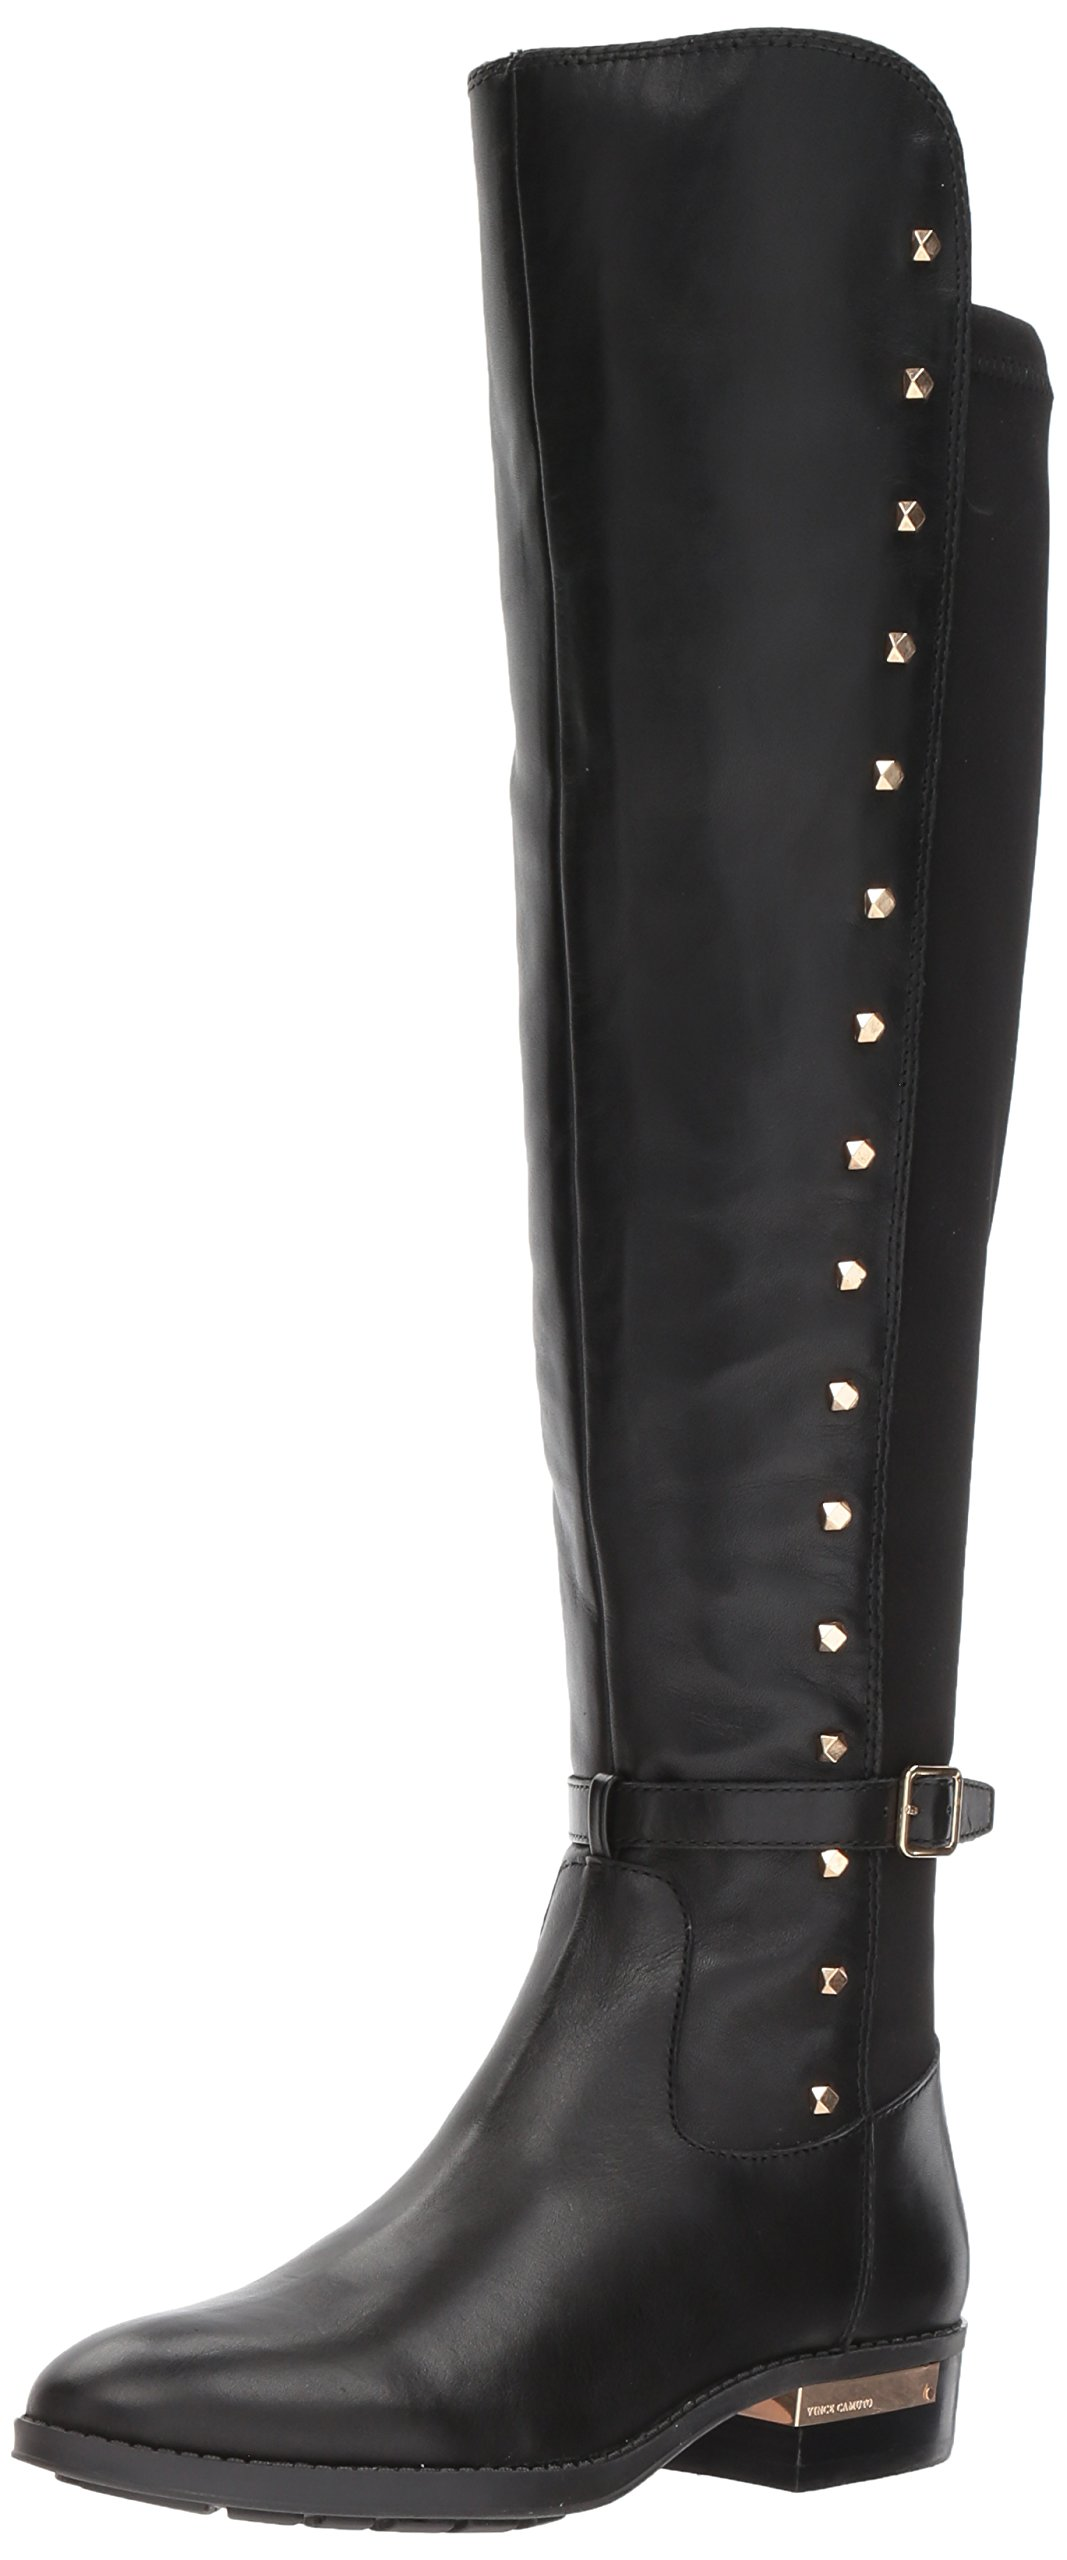 Vince Camuto Women's Pelda Over The Knee Boot, Black, 8.5 Medium US